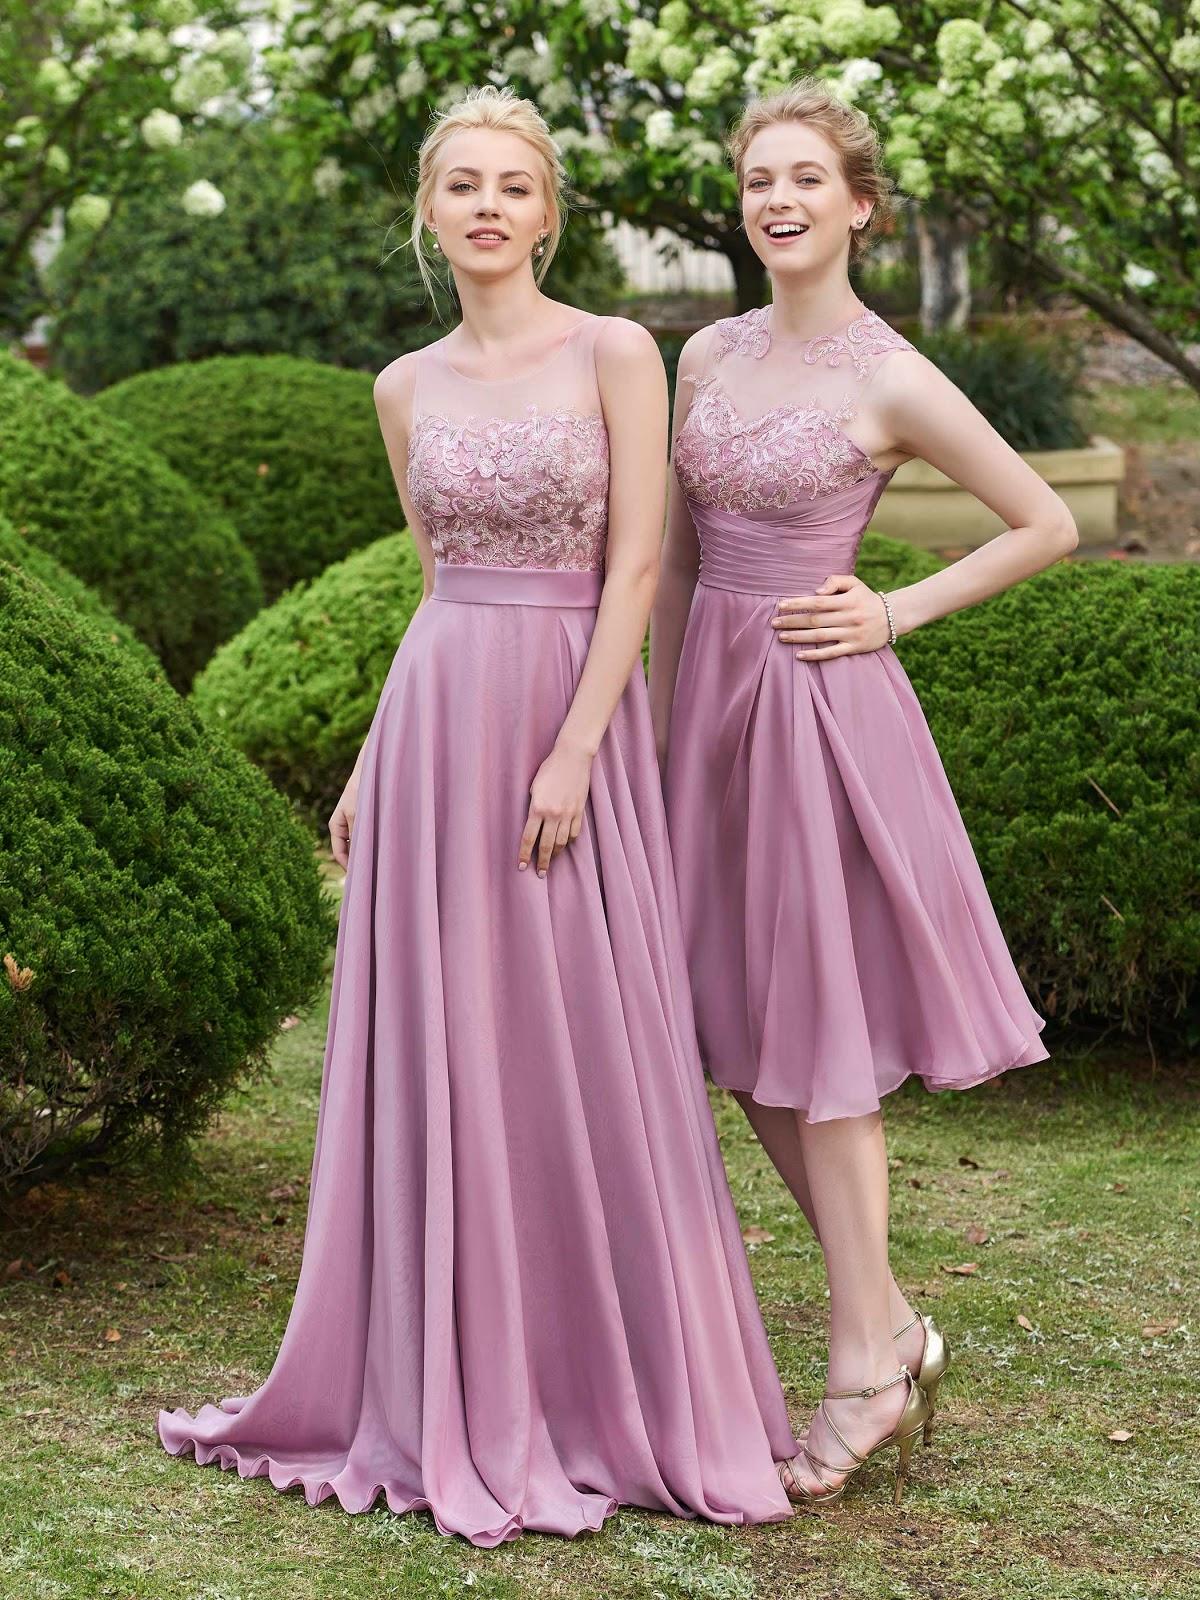 Makeup Review & Beauty Blog Fall Wedding Color Purple